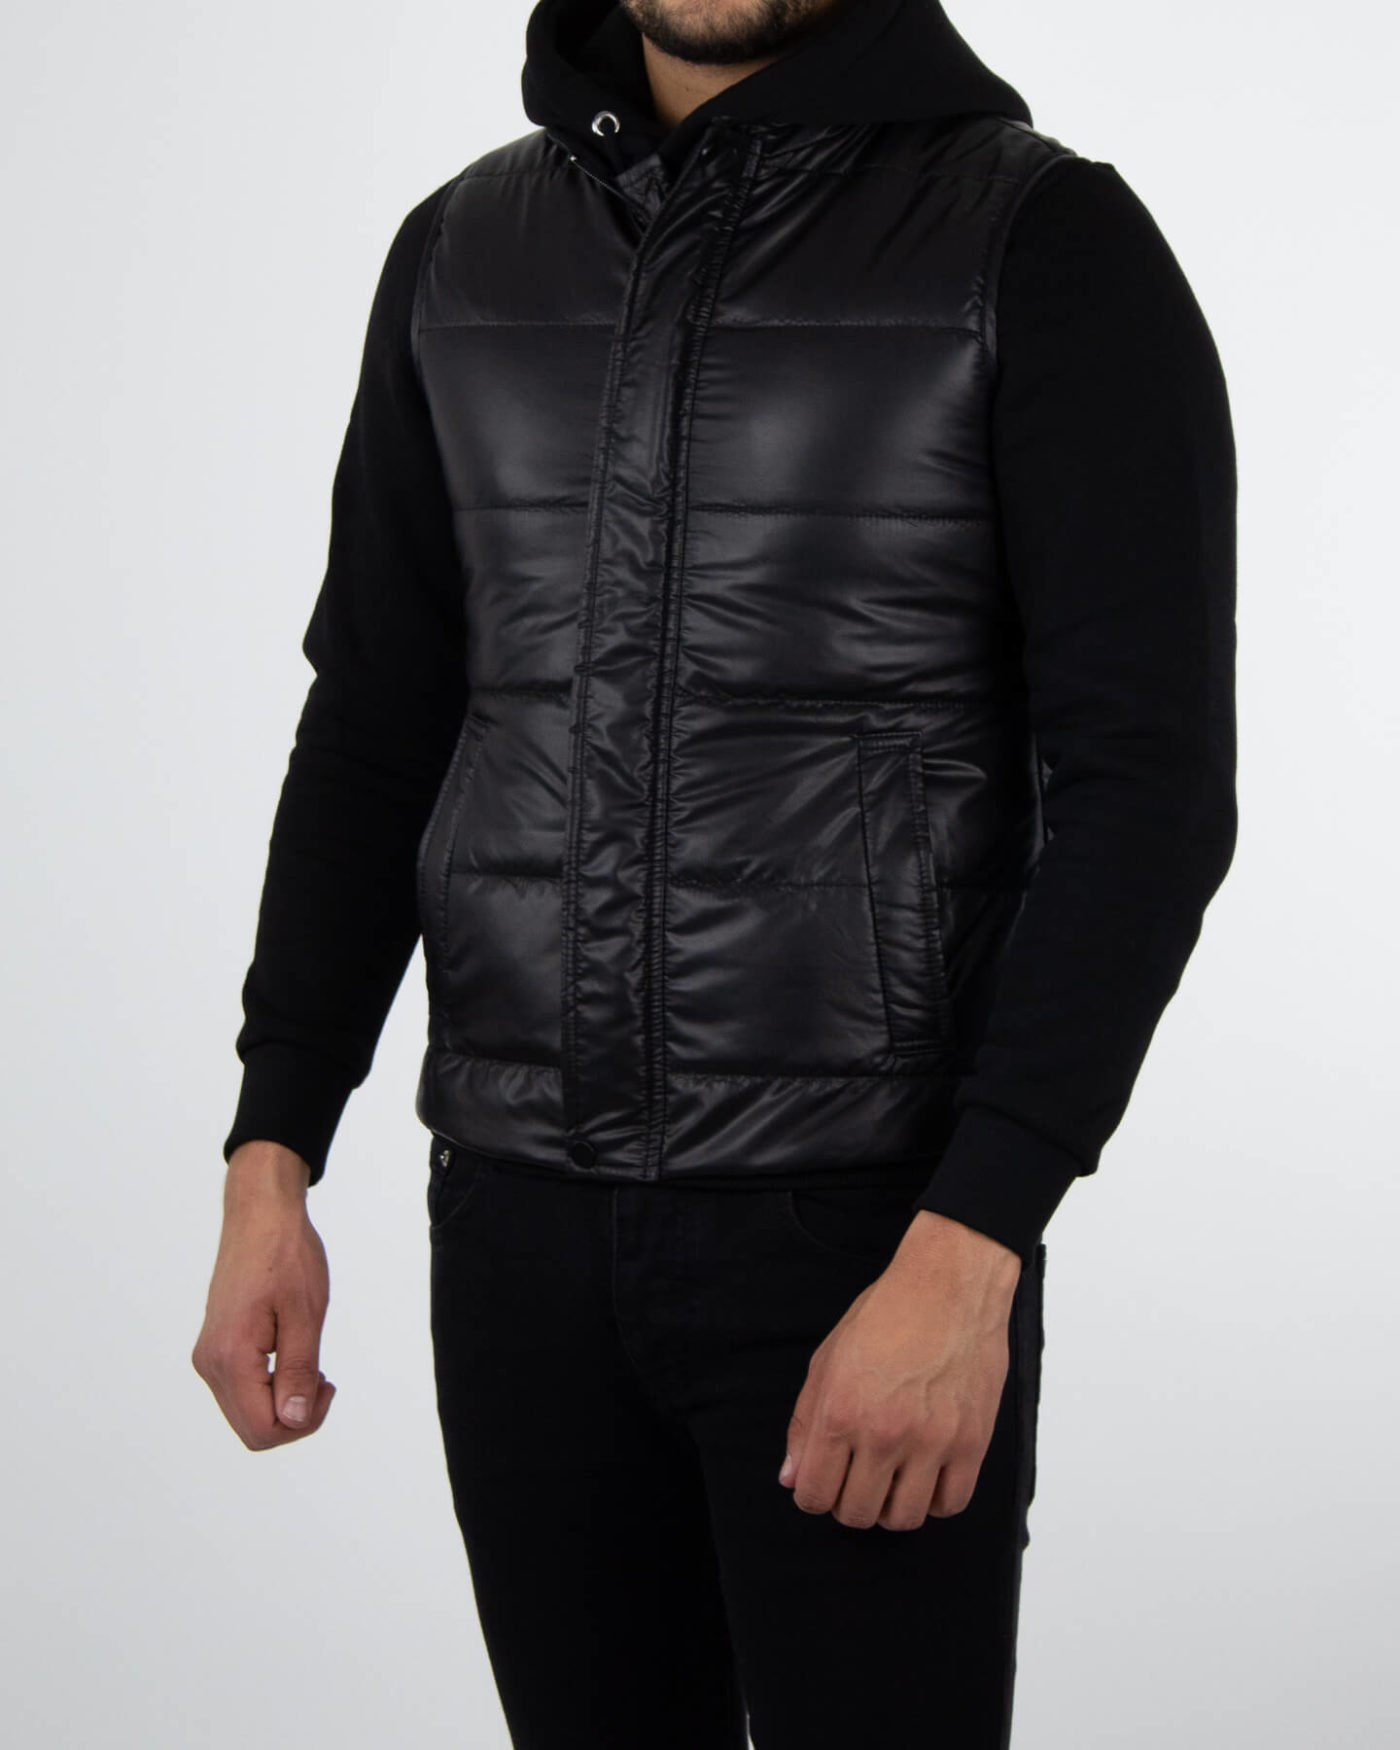 Richesse Deluxe Bodywarmer Black-3